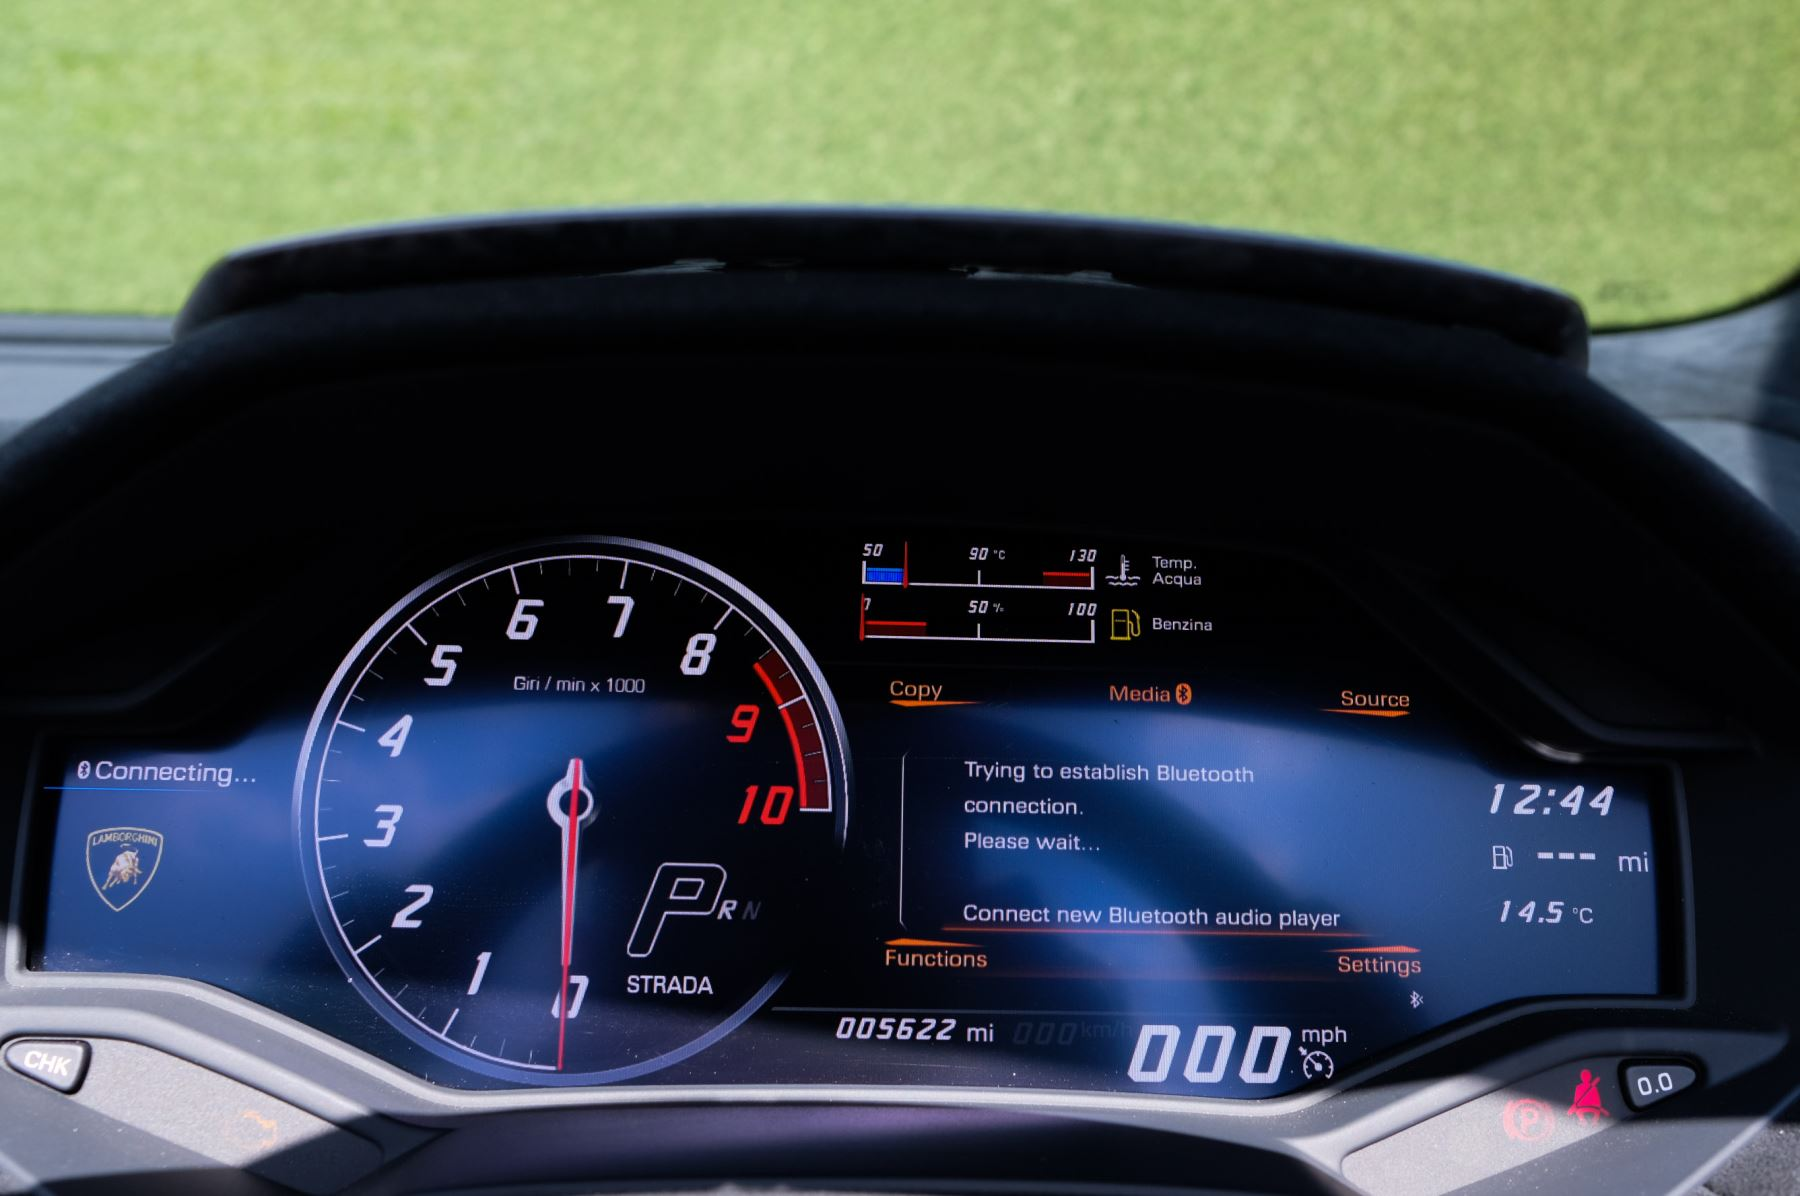 Lamborghini Huracan Performante Spyder 5.2 V10 AWD image 16